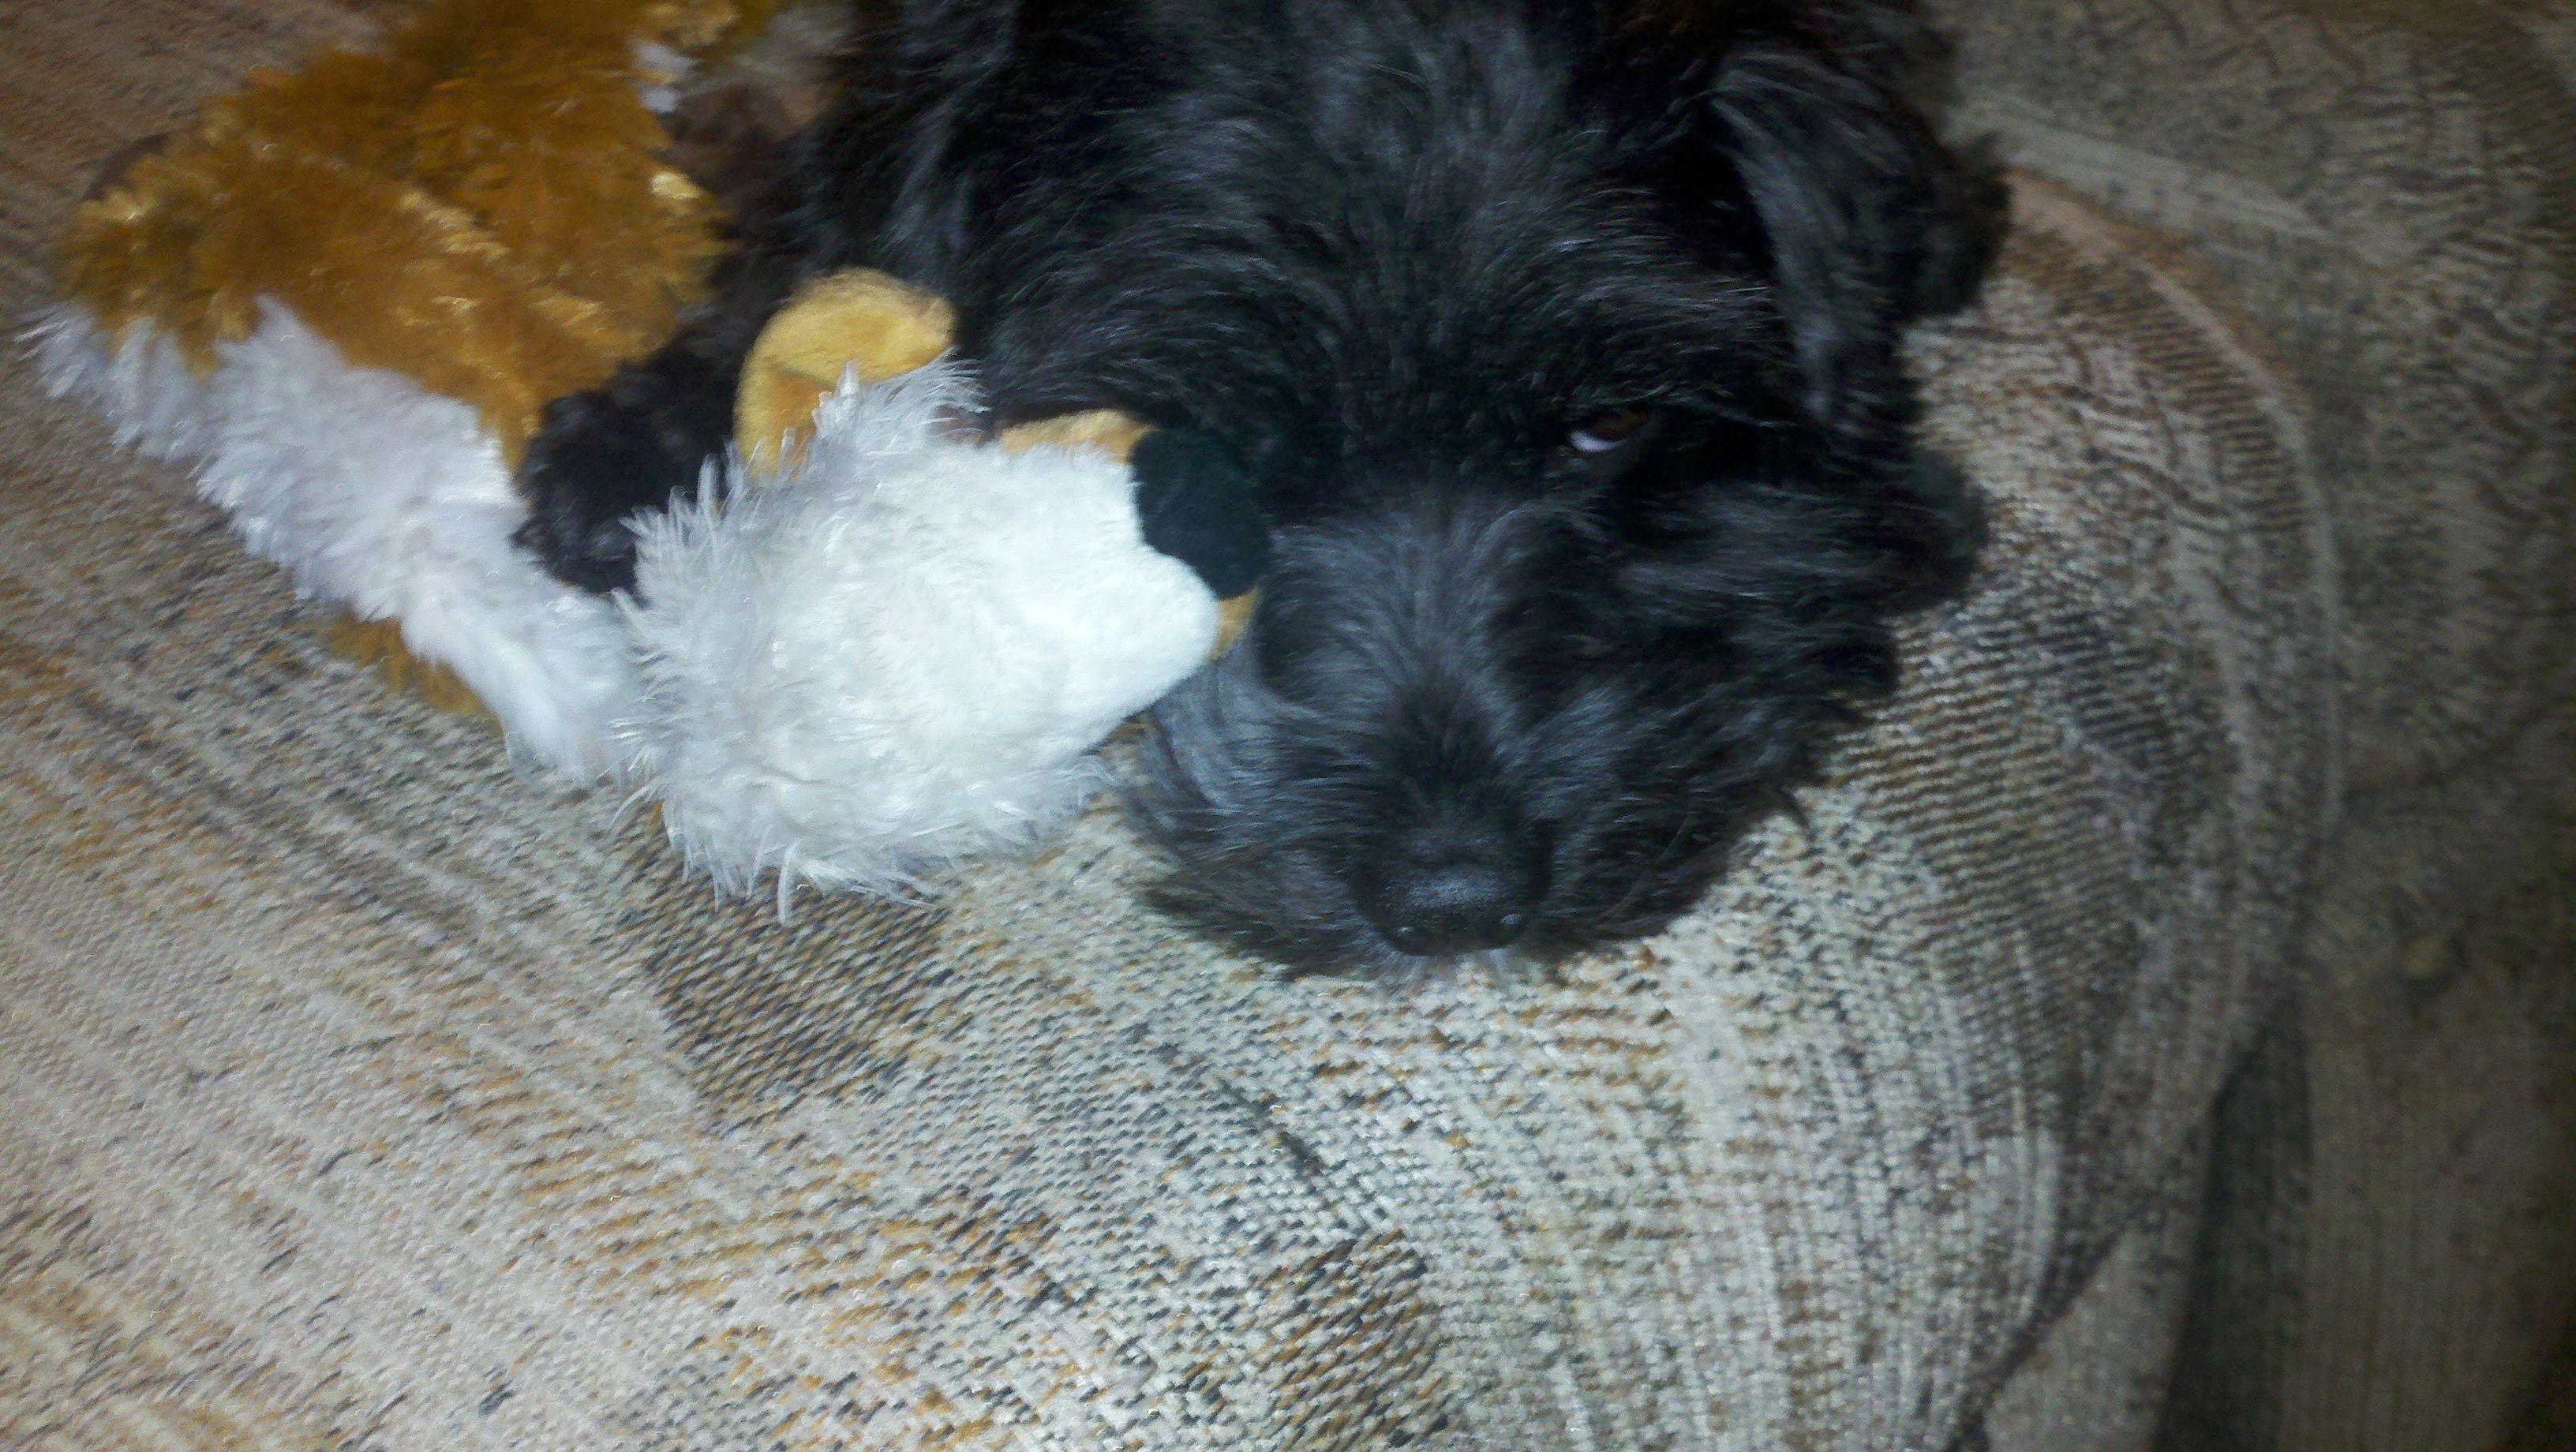 my puppy anjill cuddling with her stuffed fox.